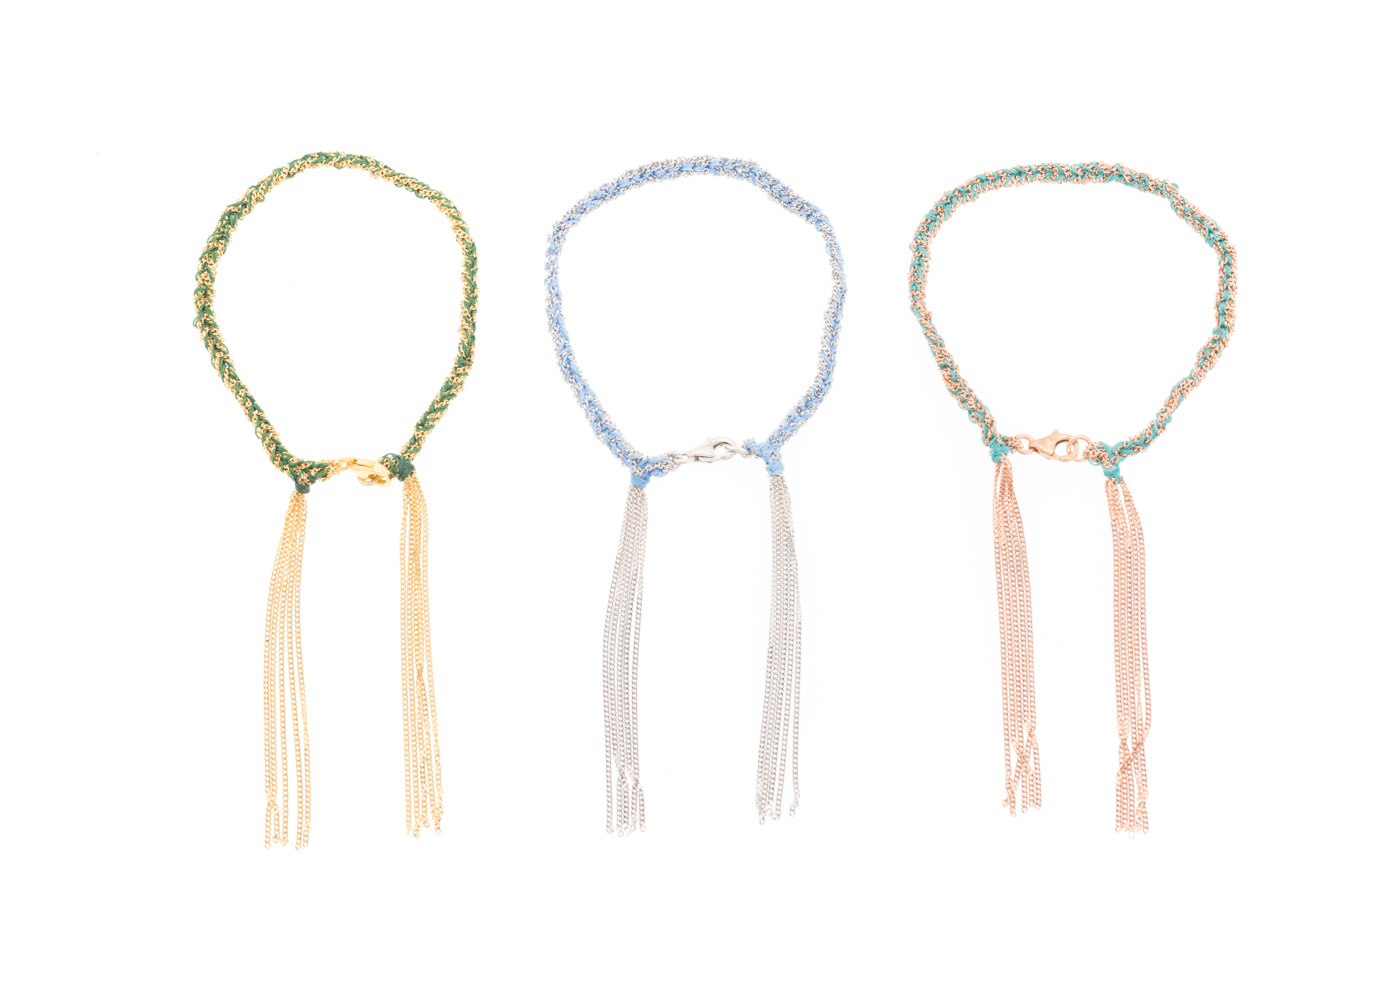 Thin Rope with Tassle $95 (4).jpg